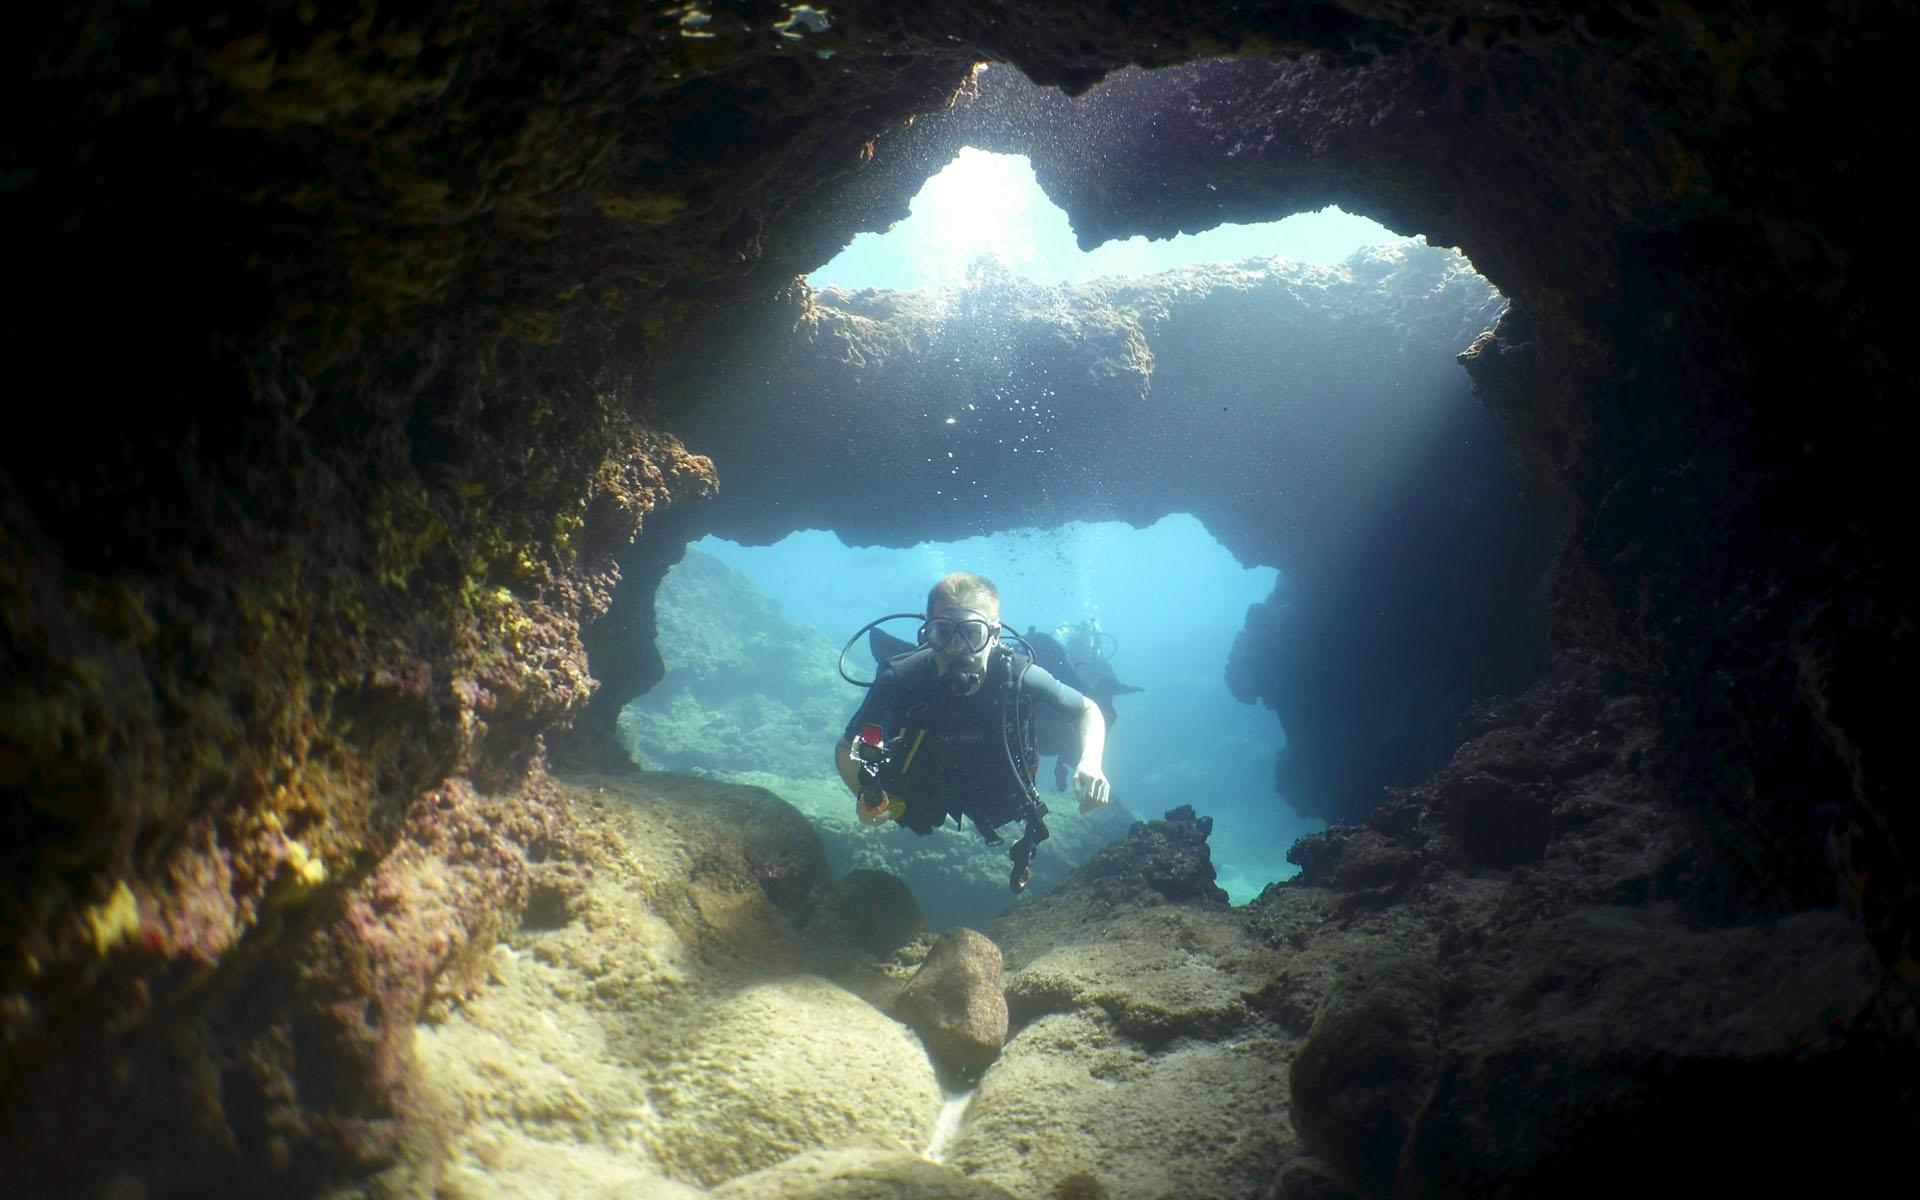 Oahu Scuba Diving Lava Tube 2